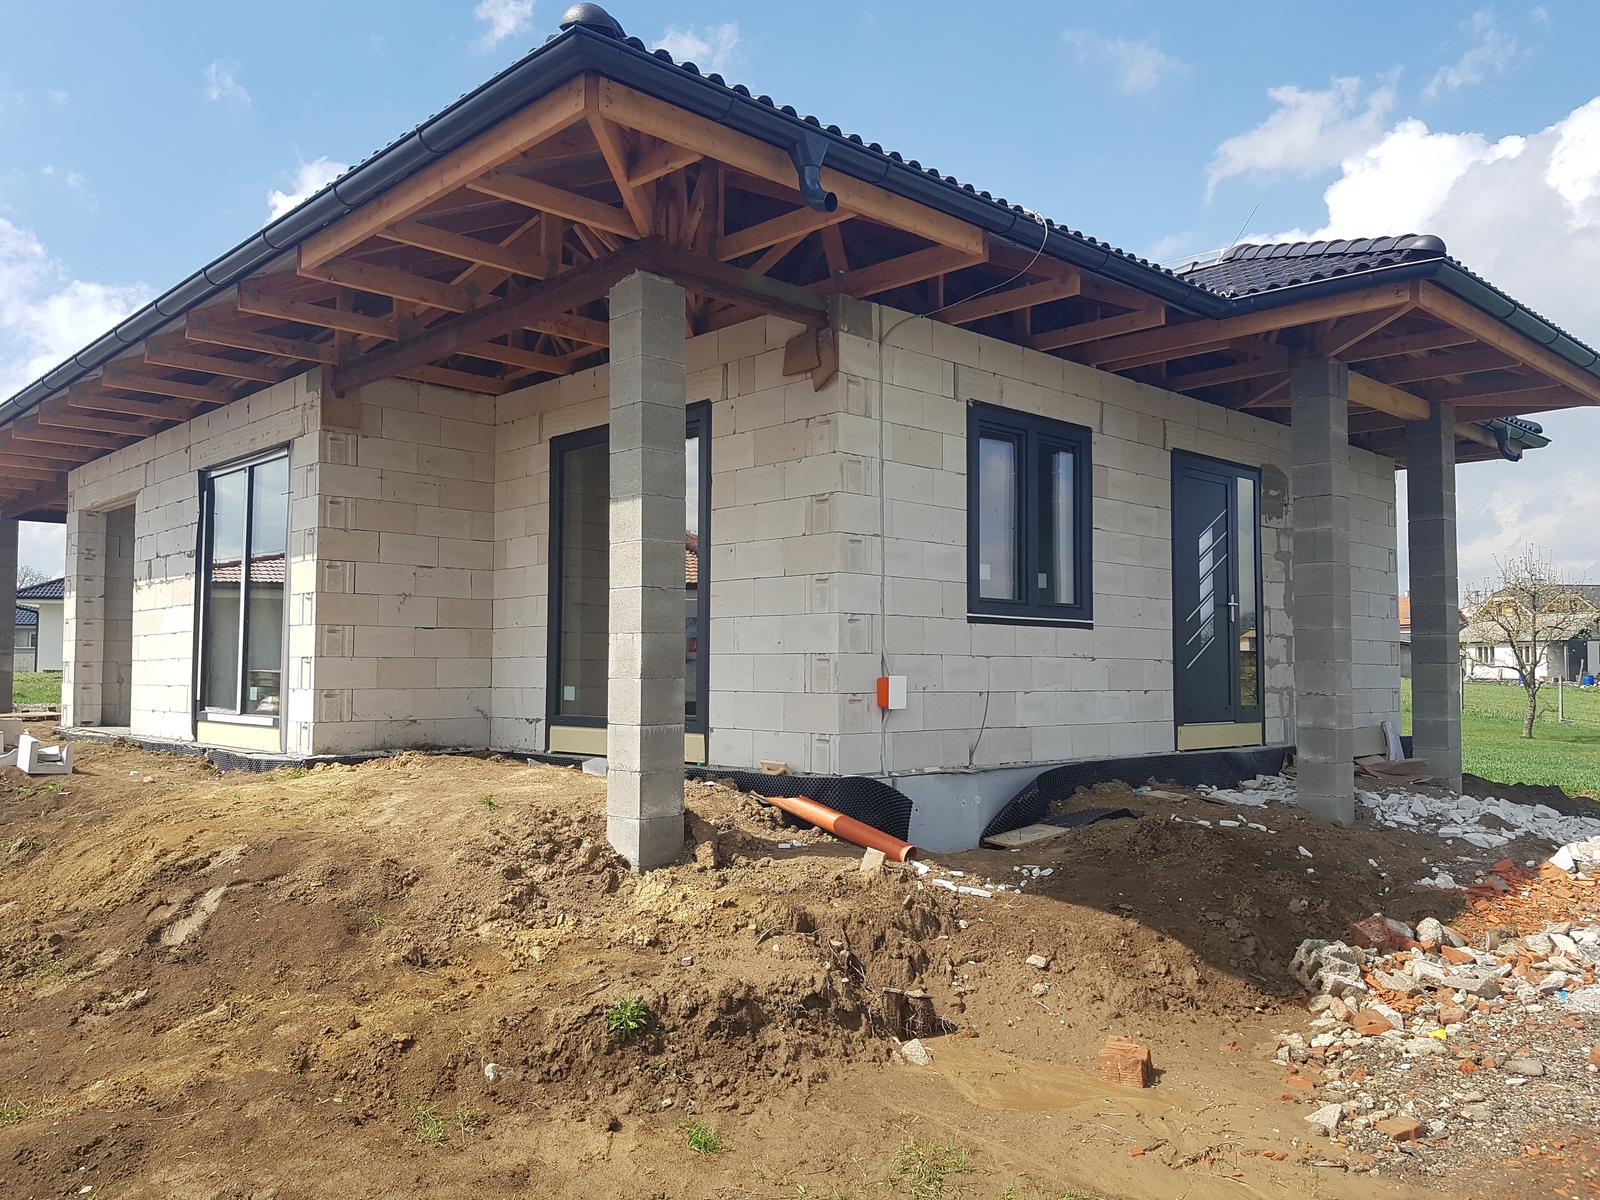 Zaciname stavat nas sen - konecne sme sa dockali okien a dveriii :)